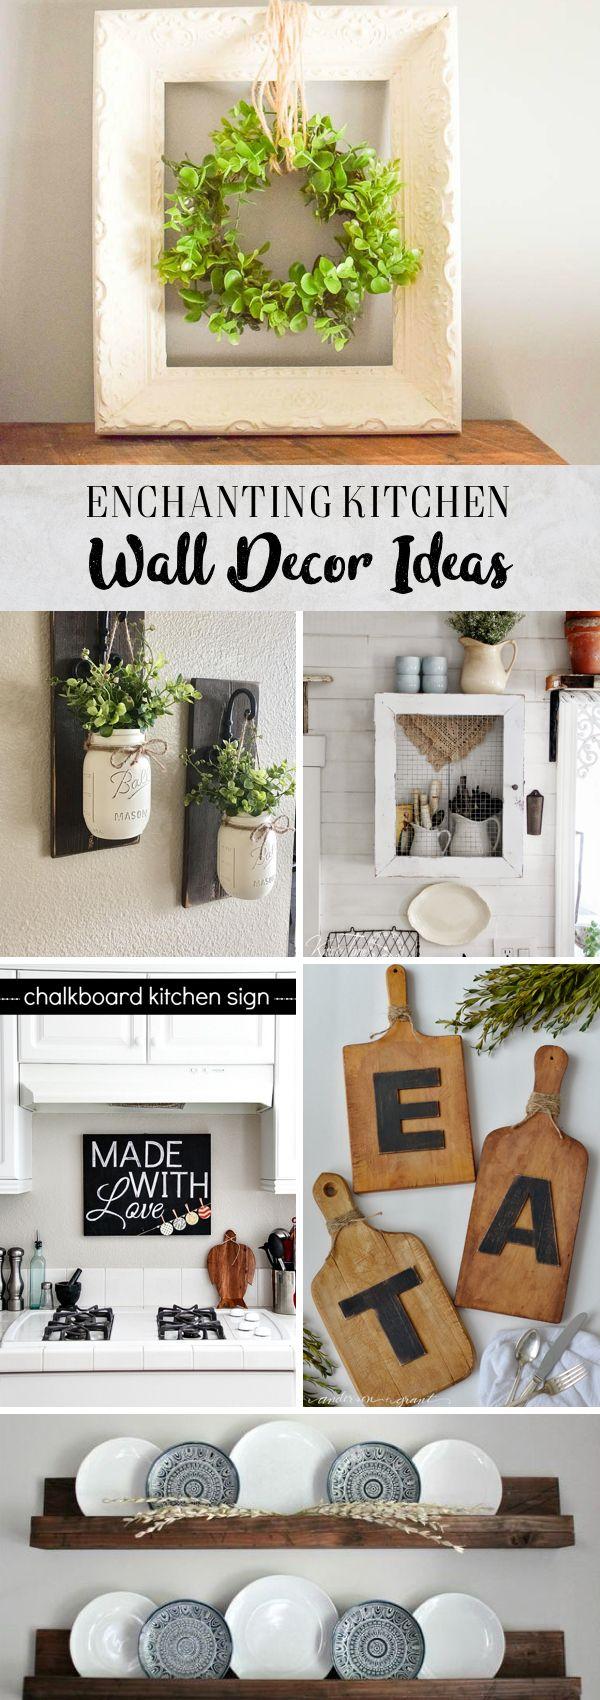 enchanting farmhouse kitchen design   30 Enchanting Kitchen Wall Decor Ideas That are Oozing ...